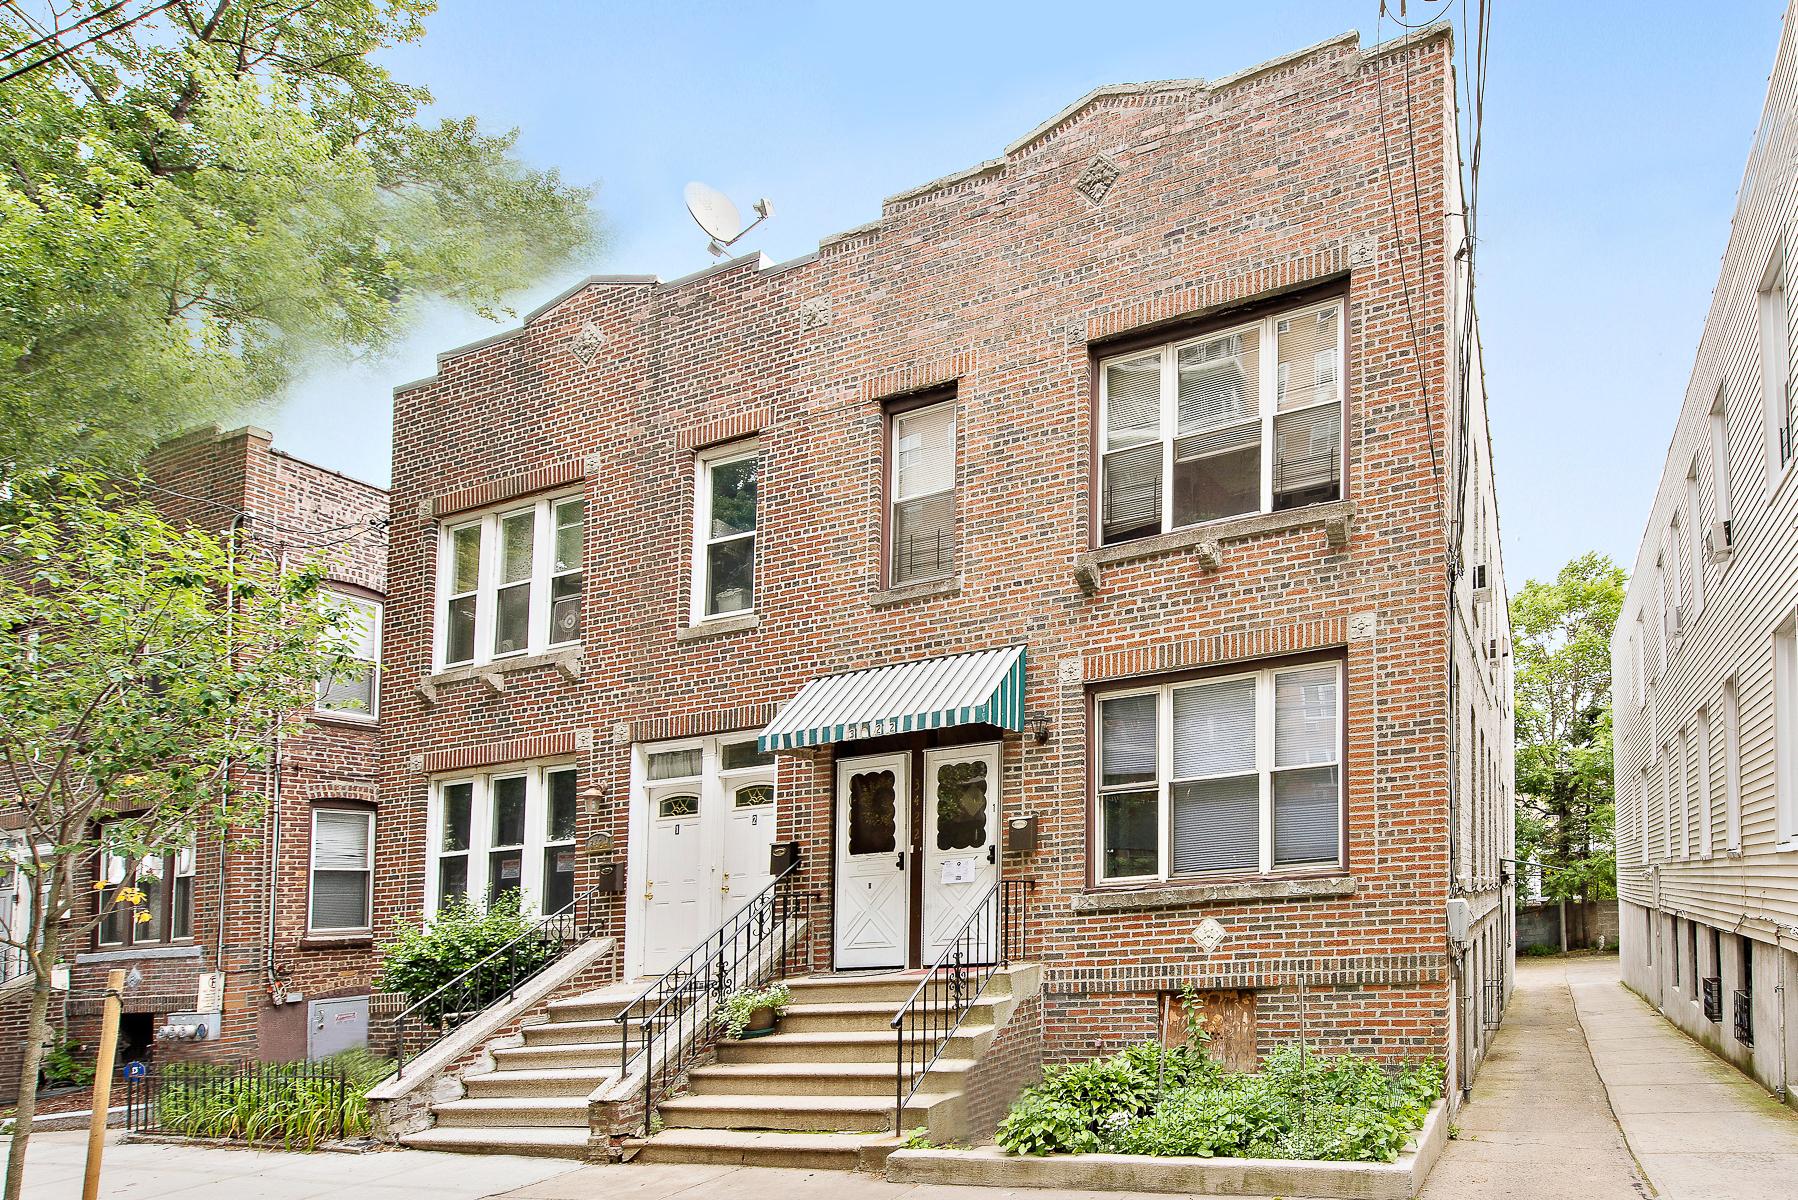 Moradia Multi-familiar para Venda às Large 2-Family with Garage 3422 Irwin Avenue Bronx, Nova York, 10463 Estados Unidos